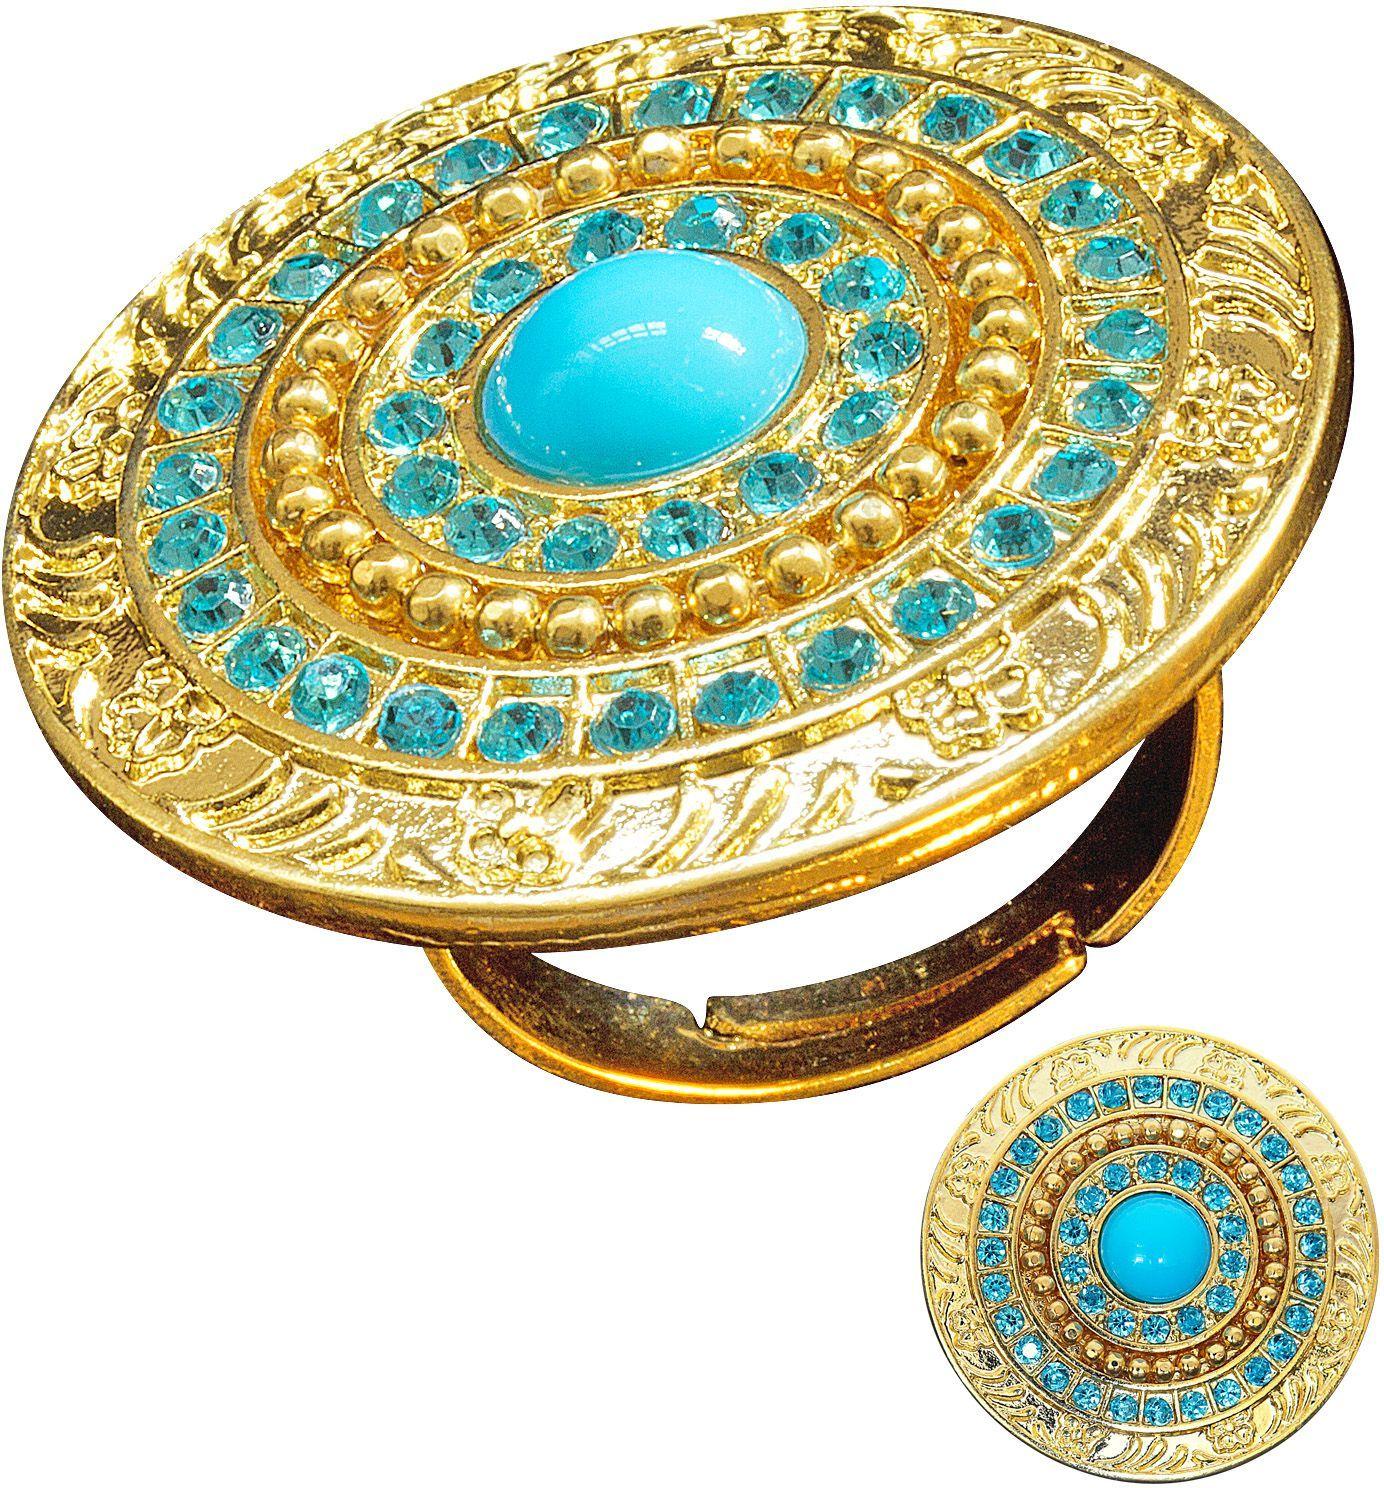 Egyptische Cleopatra ring